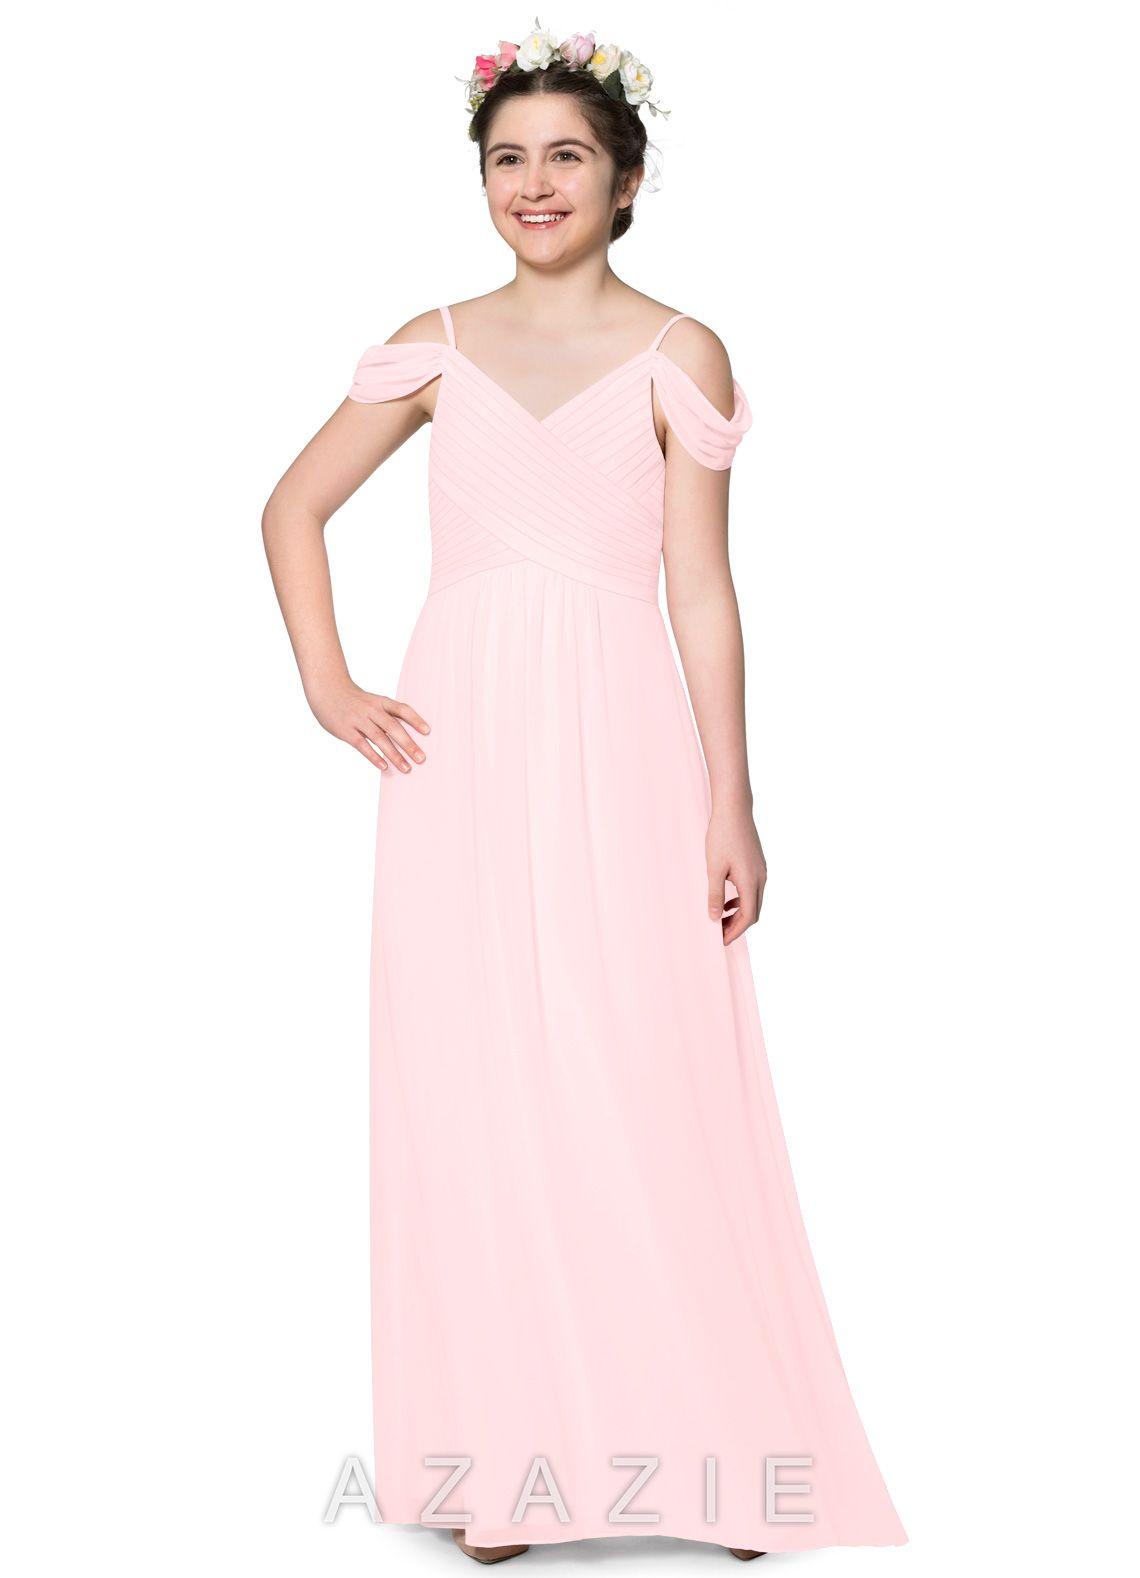 be55b2f6303 Dusty Rose Junior Bridesmaid Dresses - Gomes Weine AG